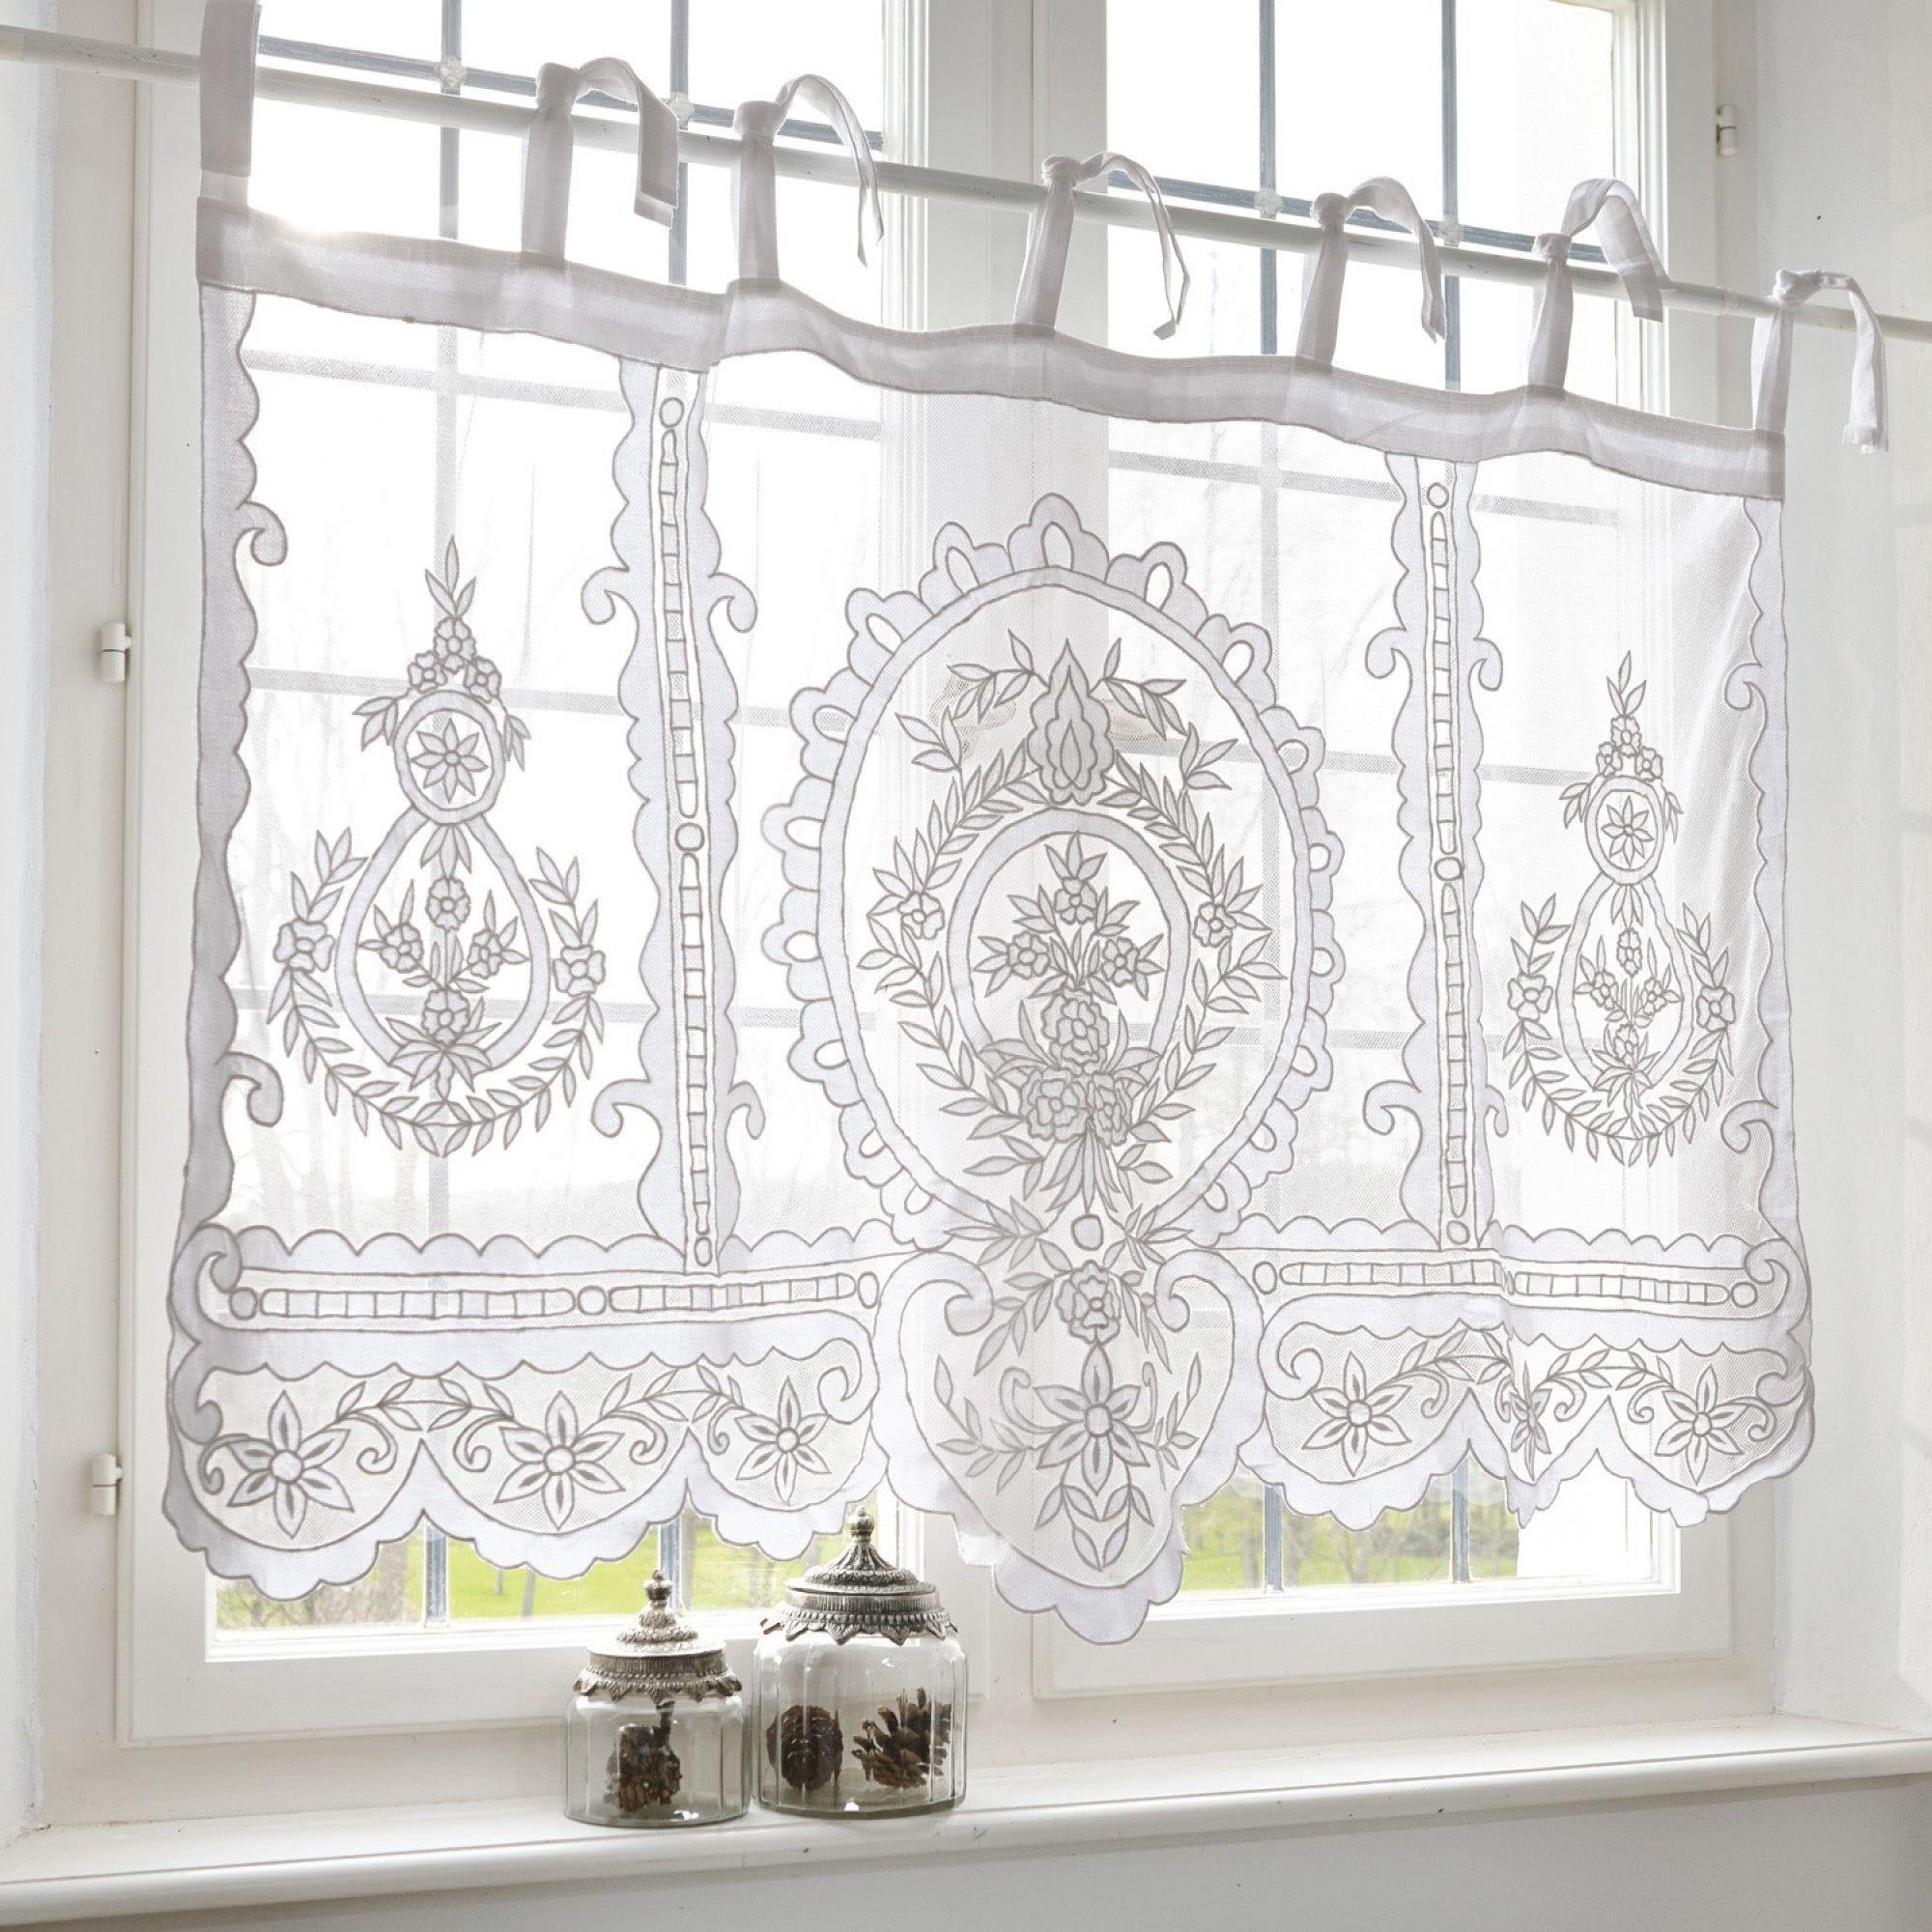 Scheibengardine Elenoire Loberon Coming Home Girlsbedroomcurtains Voilecurtainsideas Cottage Curtains Bathroom Window Curtains Voile Curtains